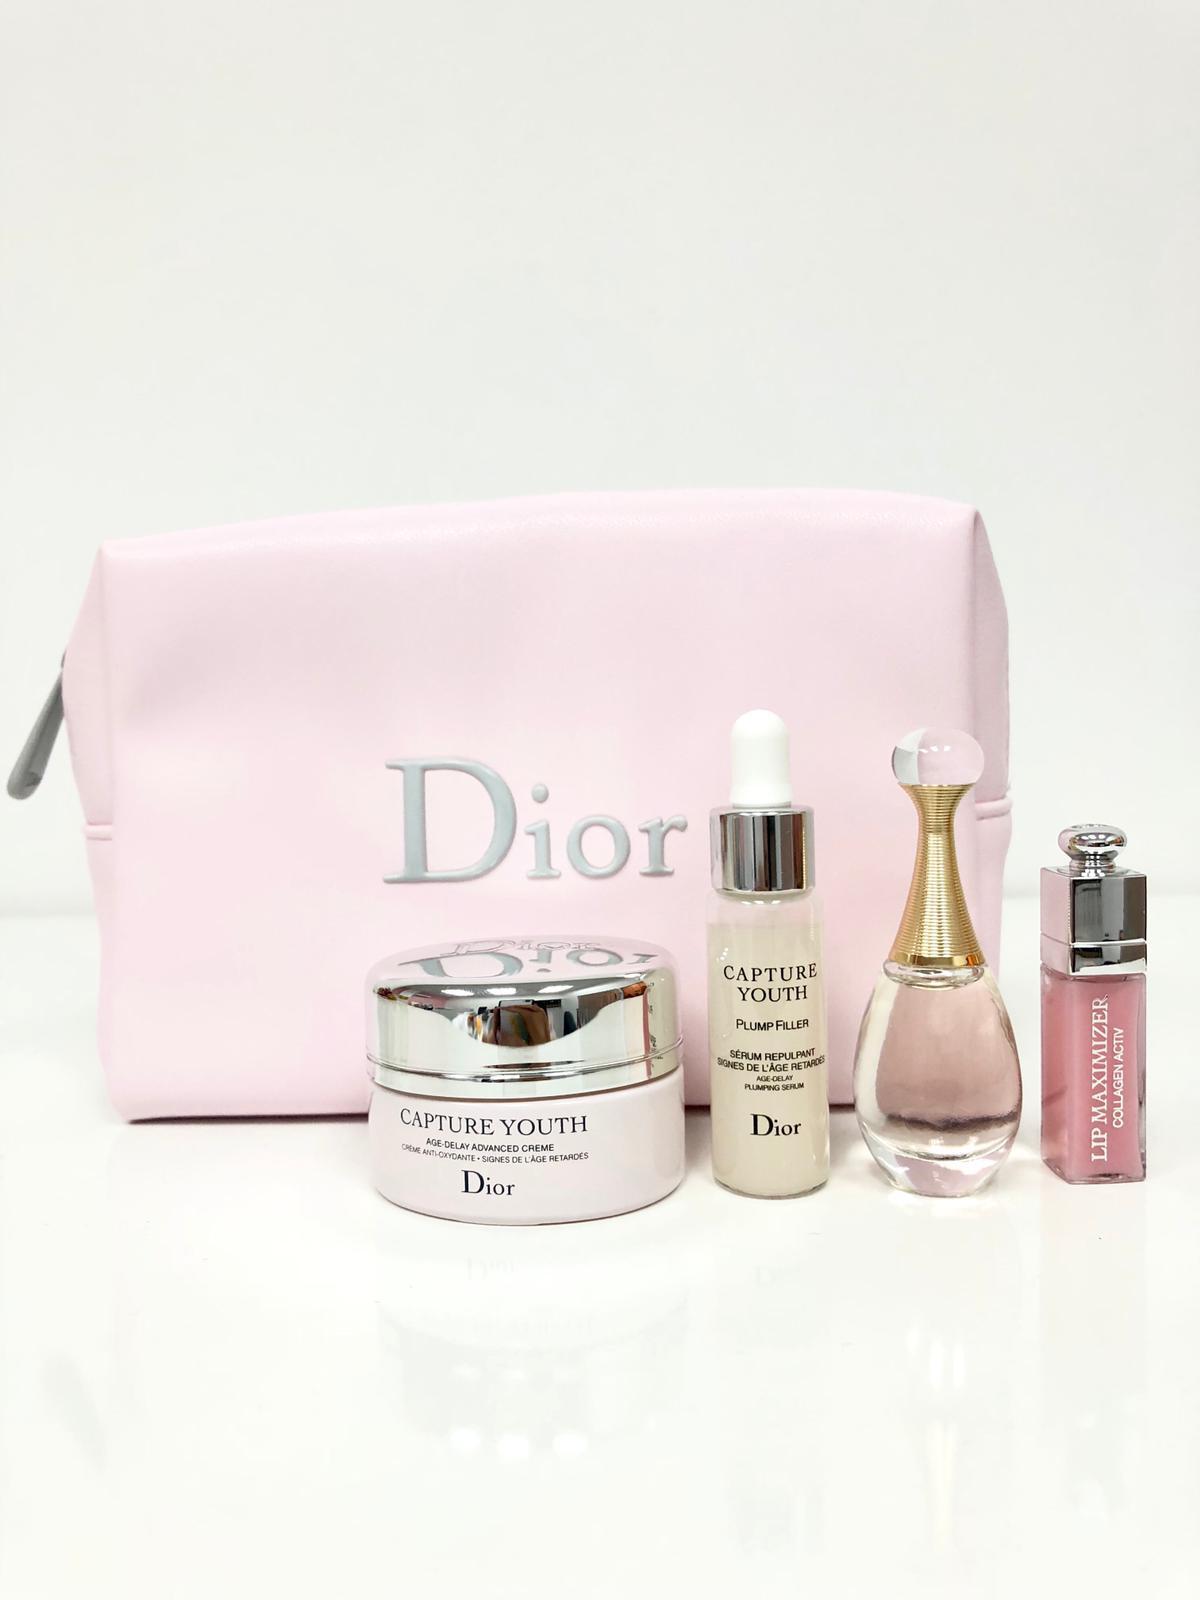 1fbee944fb0f0f Dior Gift Set - 5 PCs Set